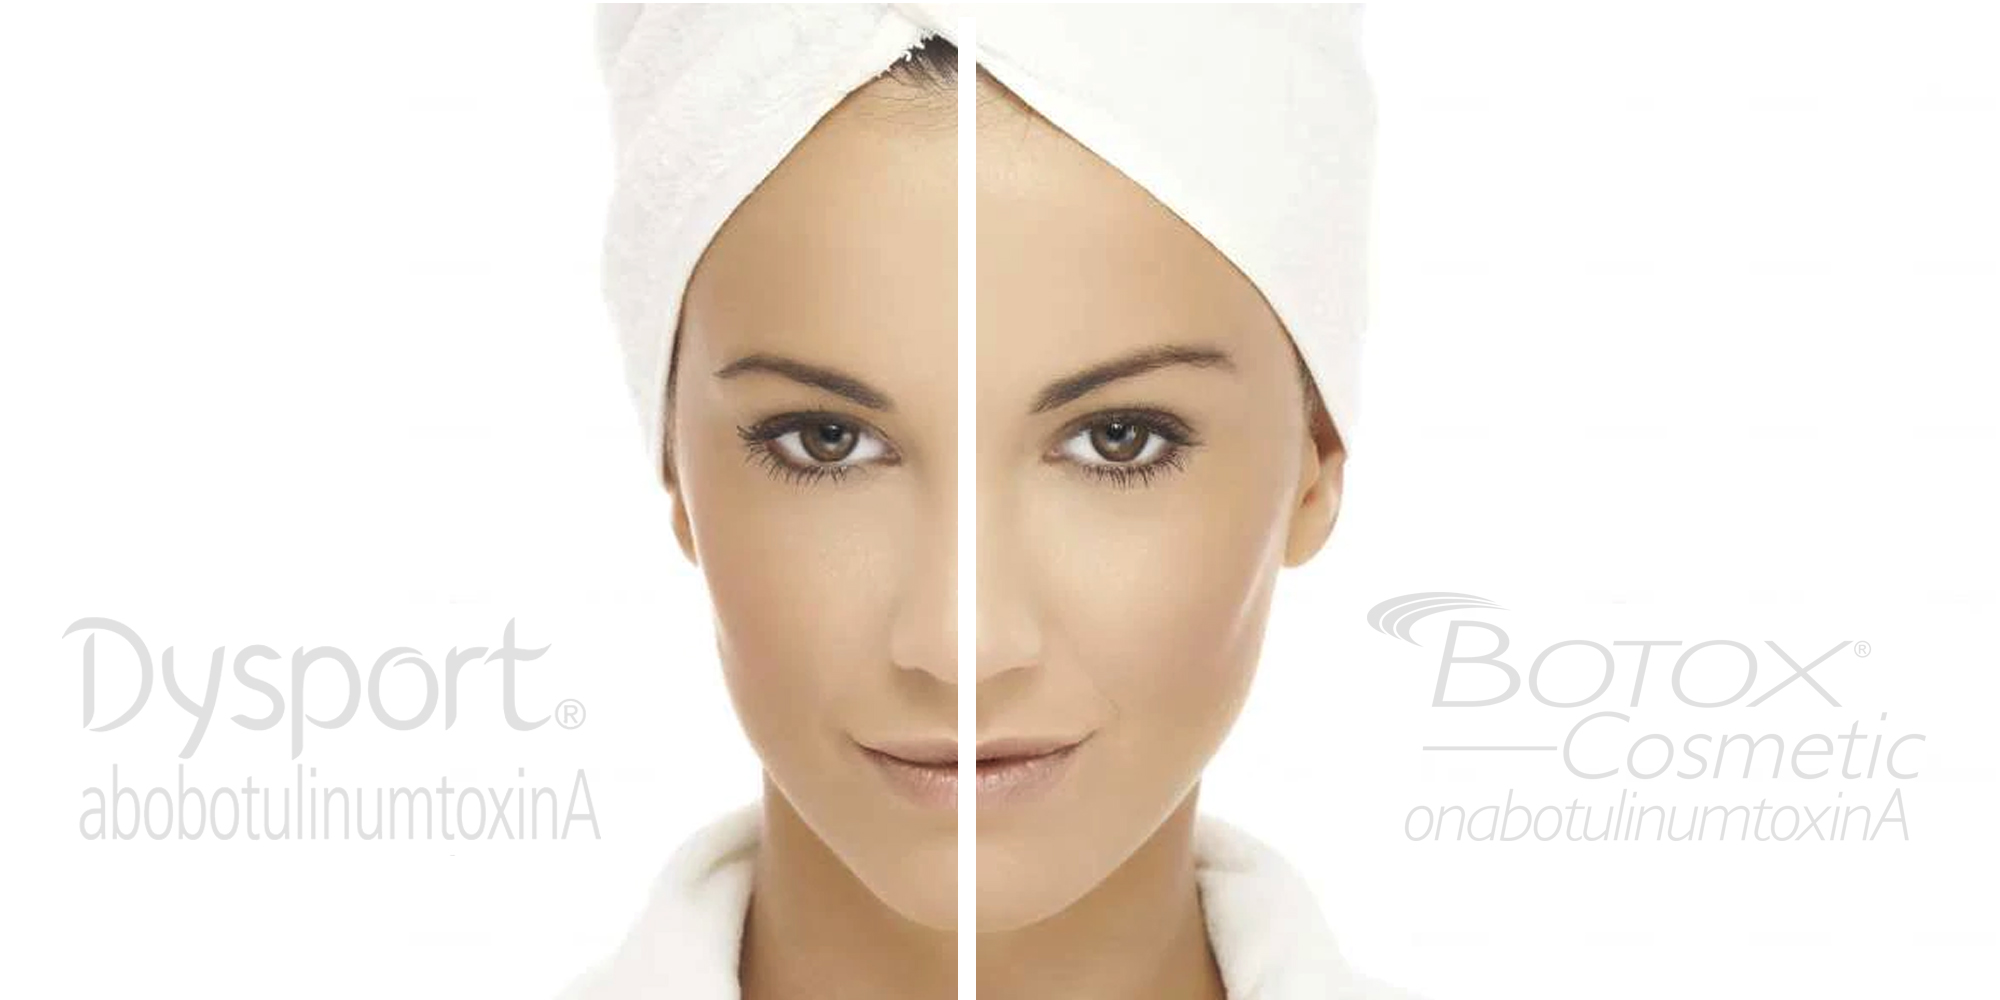 small resolution of dysport vs botox retief skin center nashville s best dermatologist cosmetic dermatology team